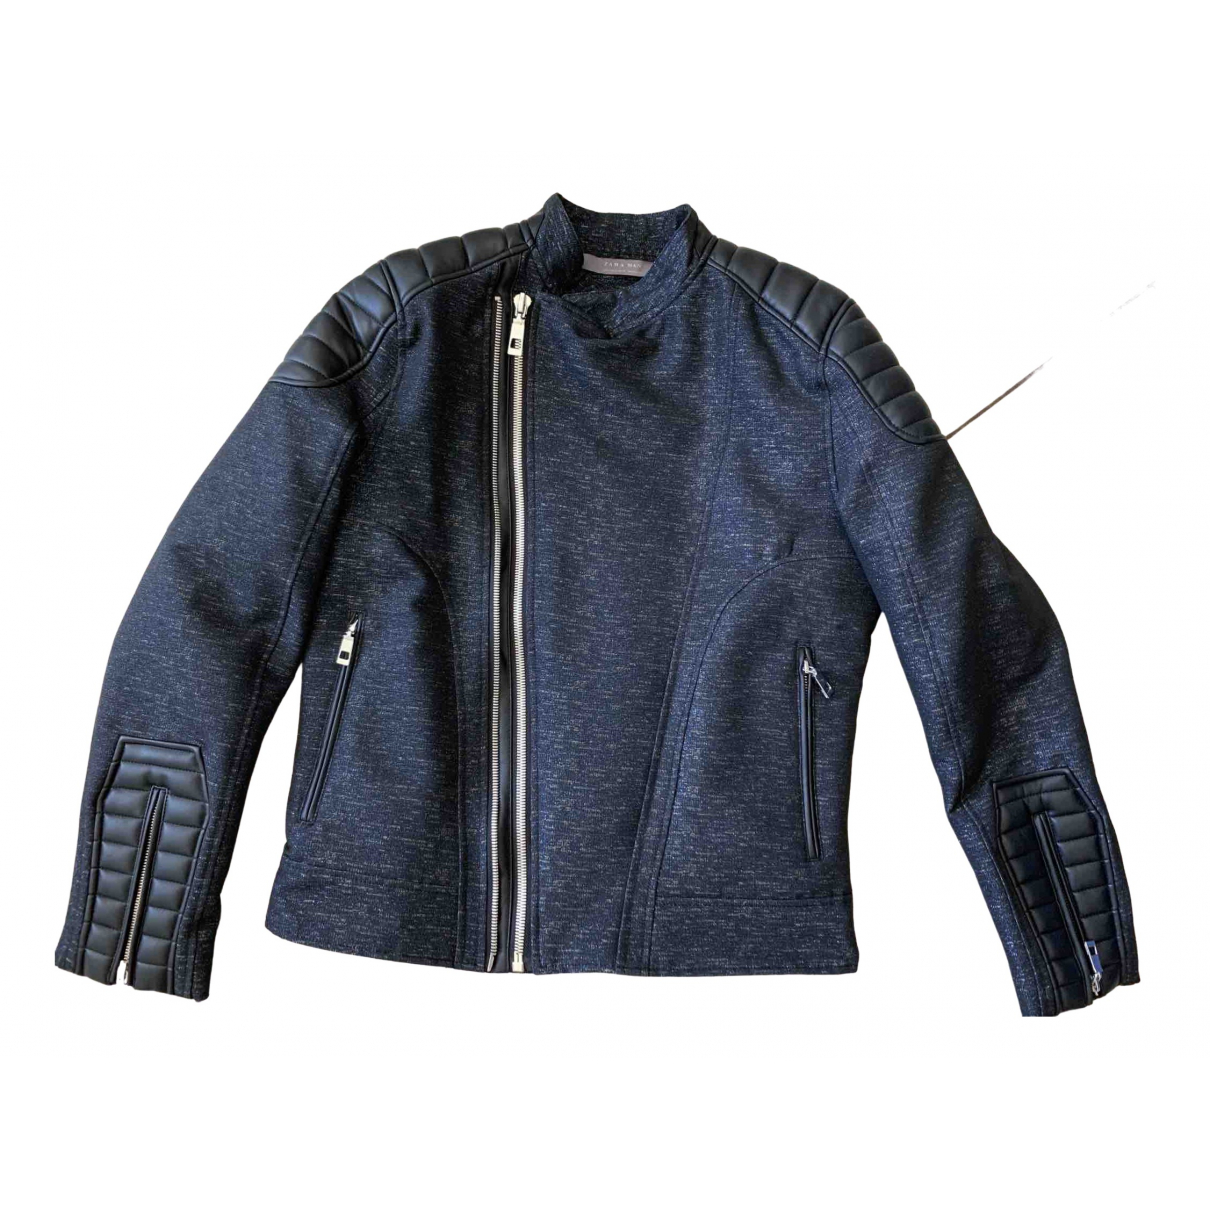 Zara \N Blue jacket  for Men M International